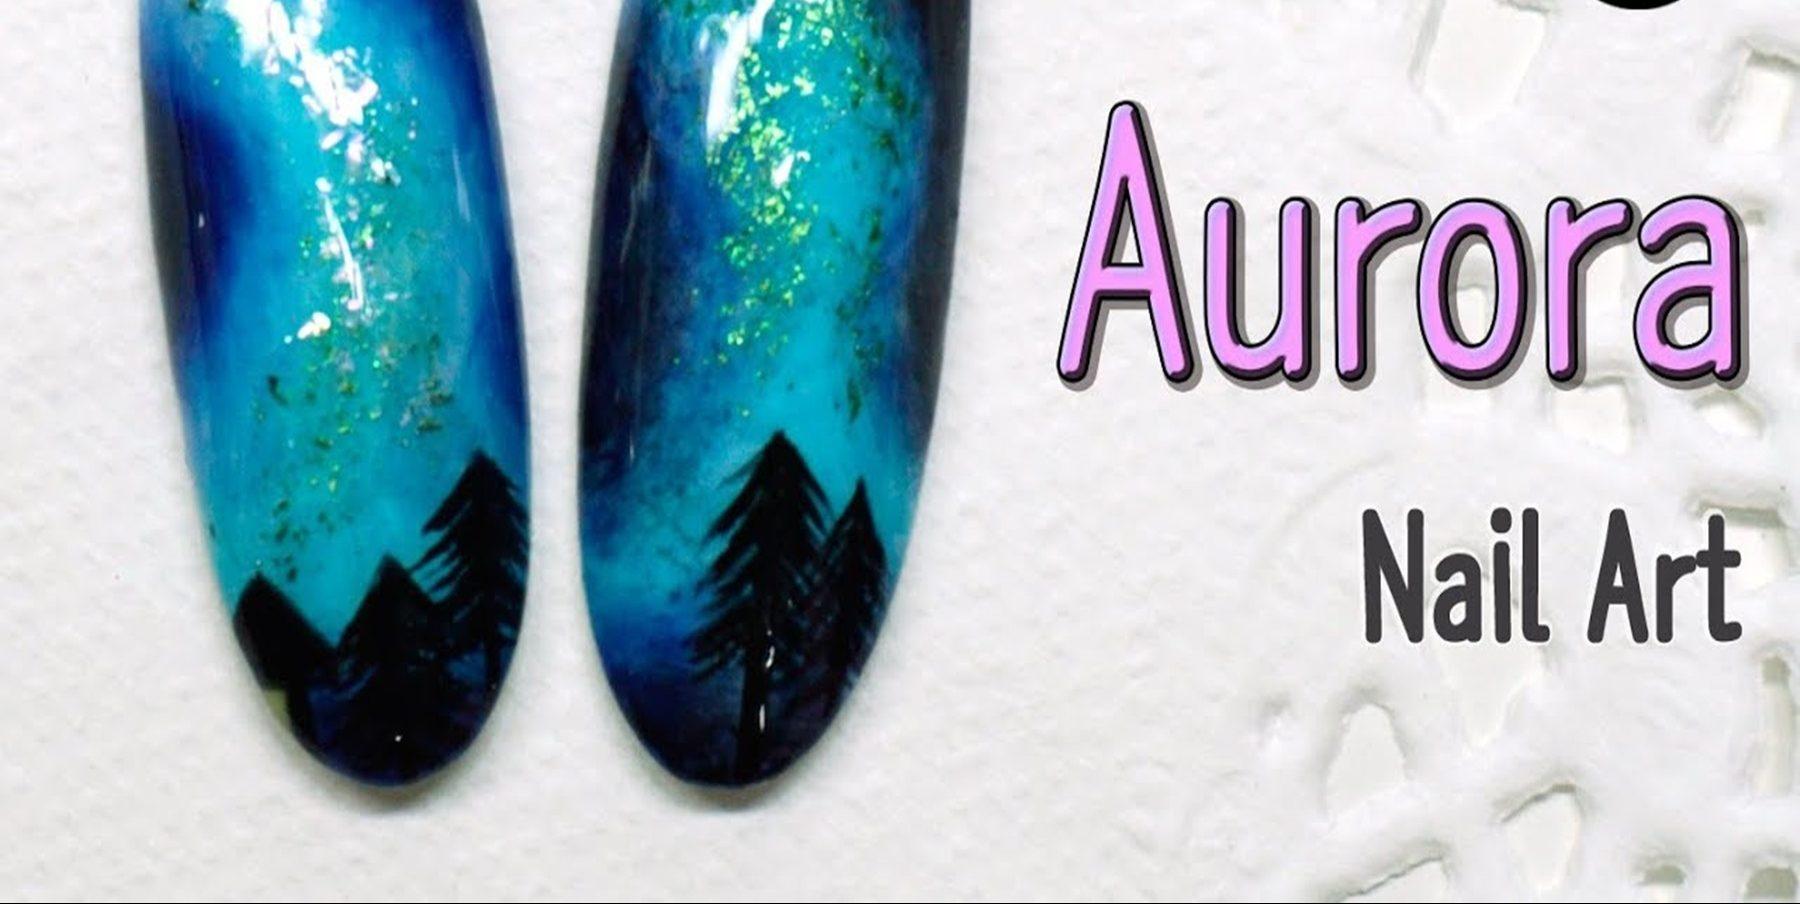 Aurora nails: Η απόλυτη τάση για τα νύχια